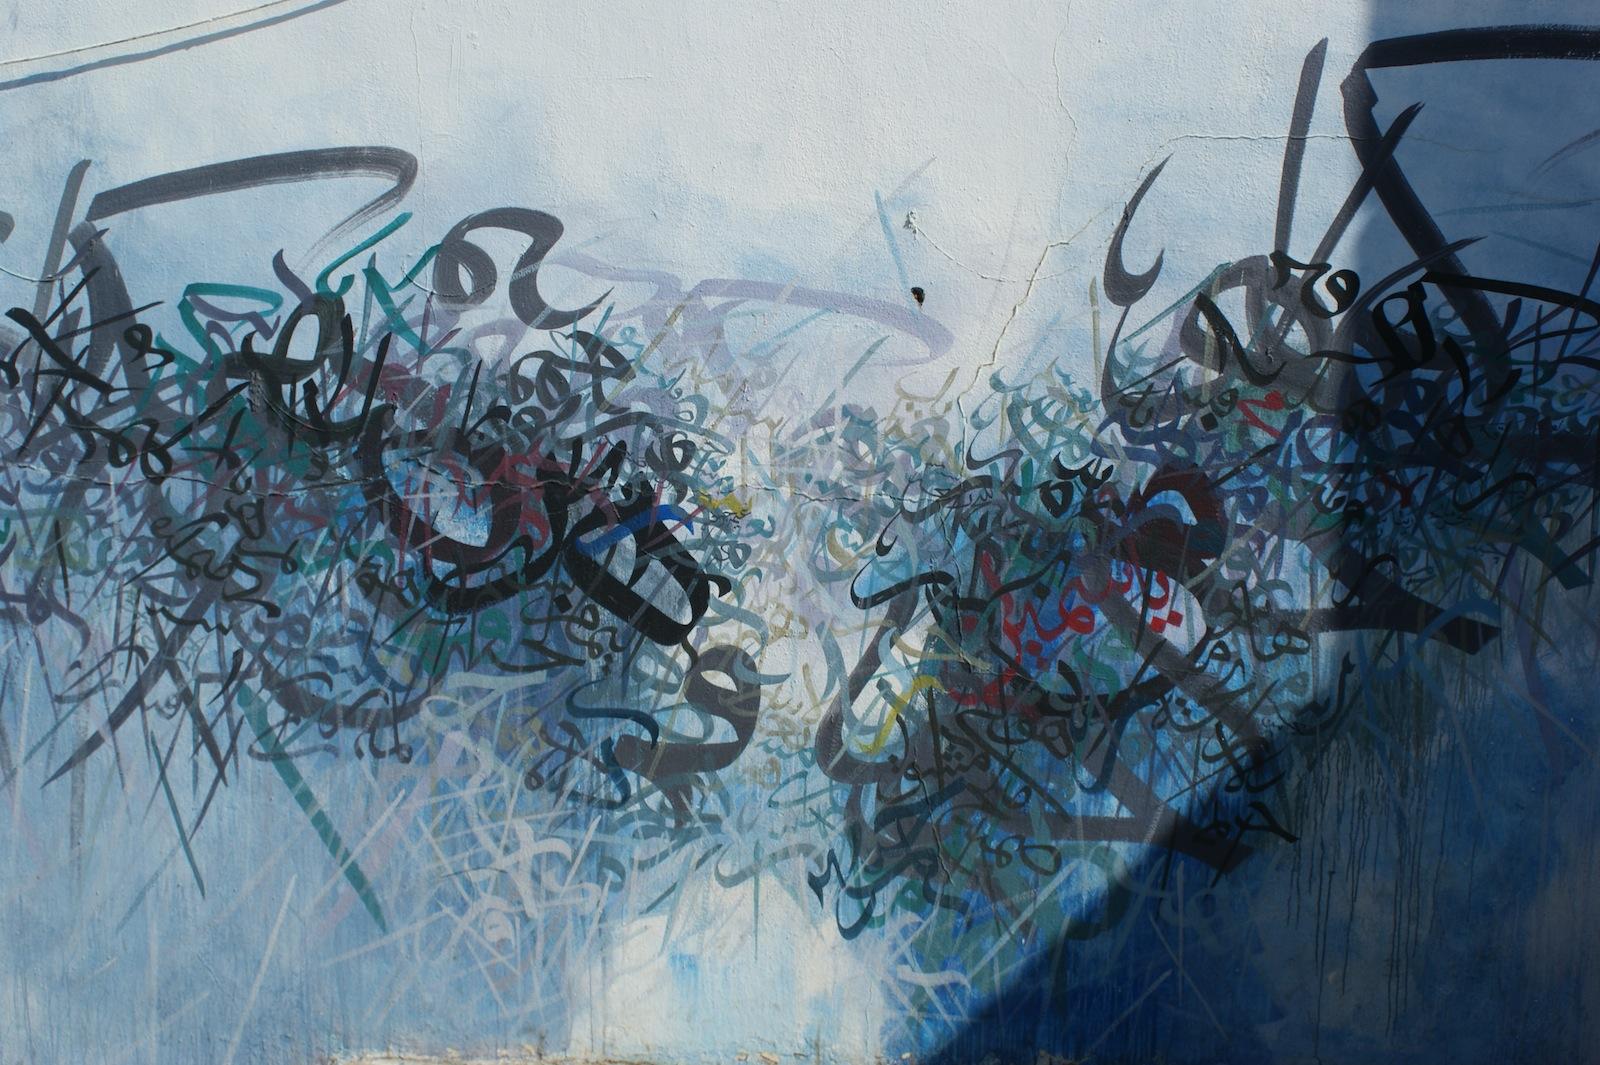 topics  art graffiti maroc street arabic writingArabic Writing Art